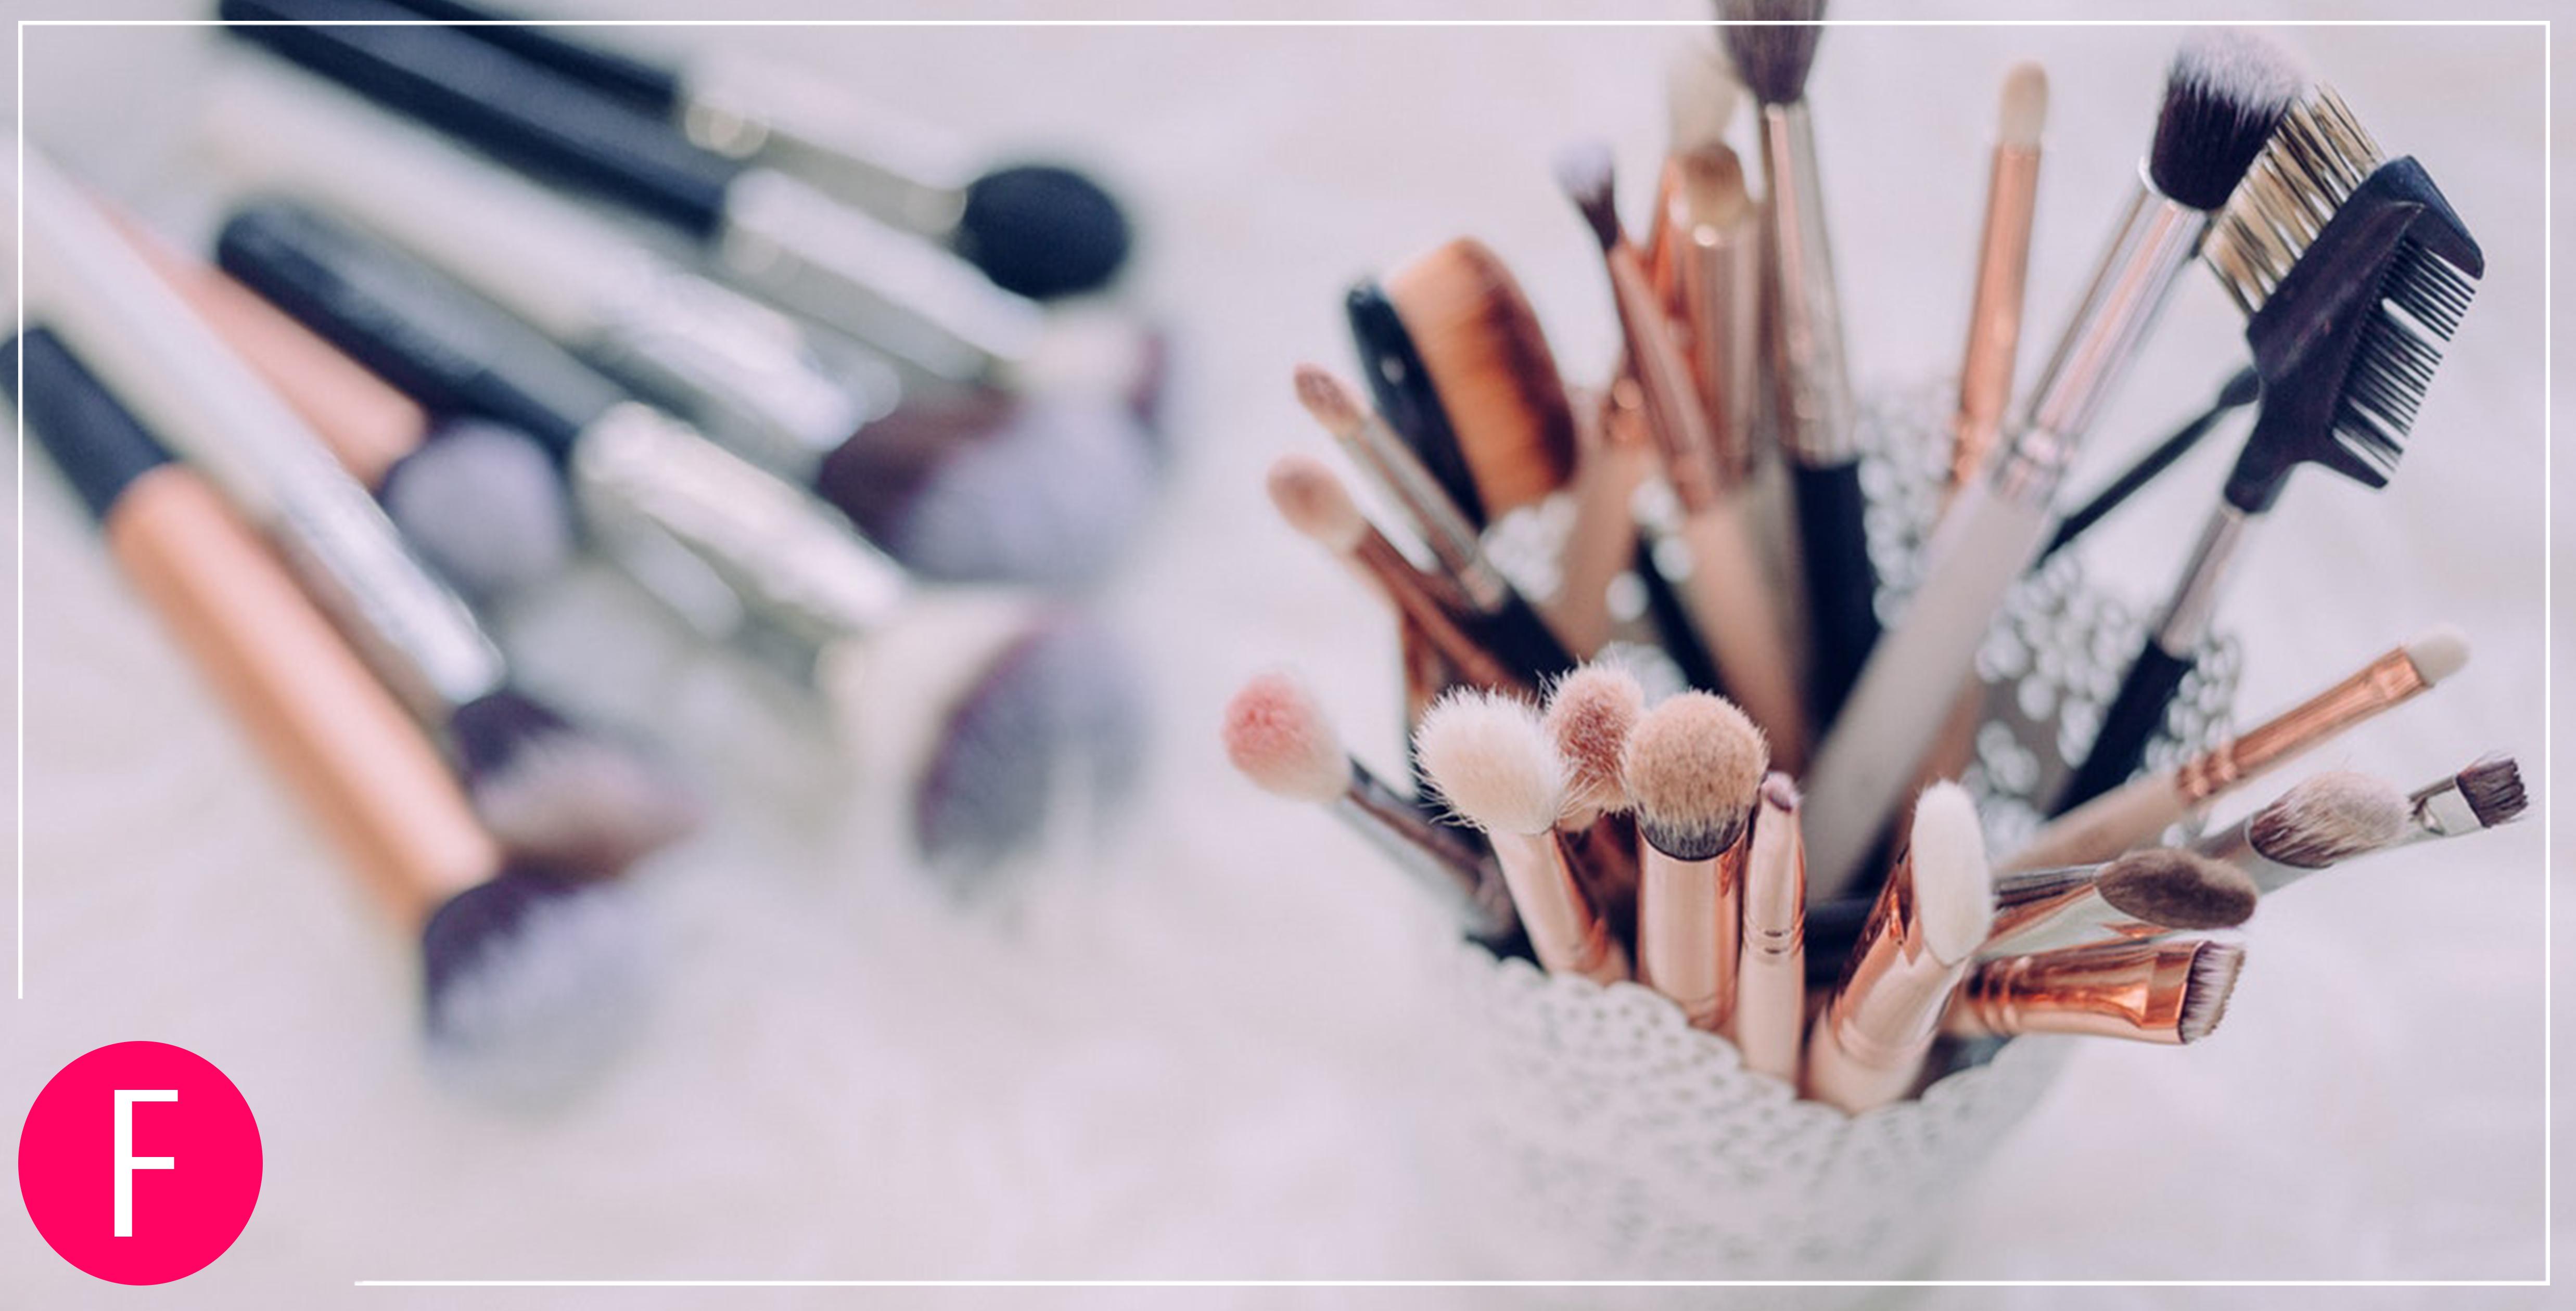 clean makeup brushes, makeup brushes